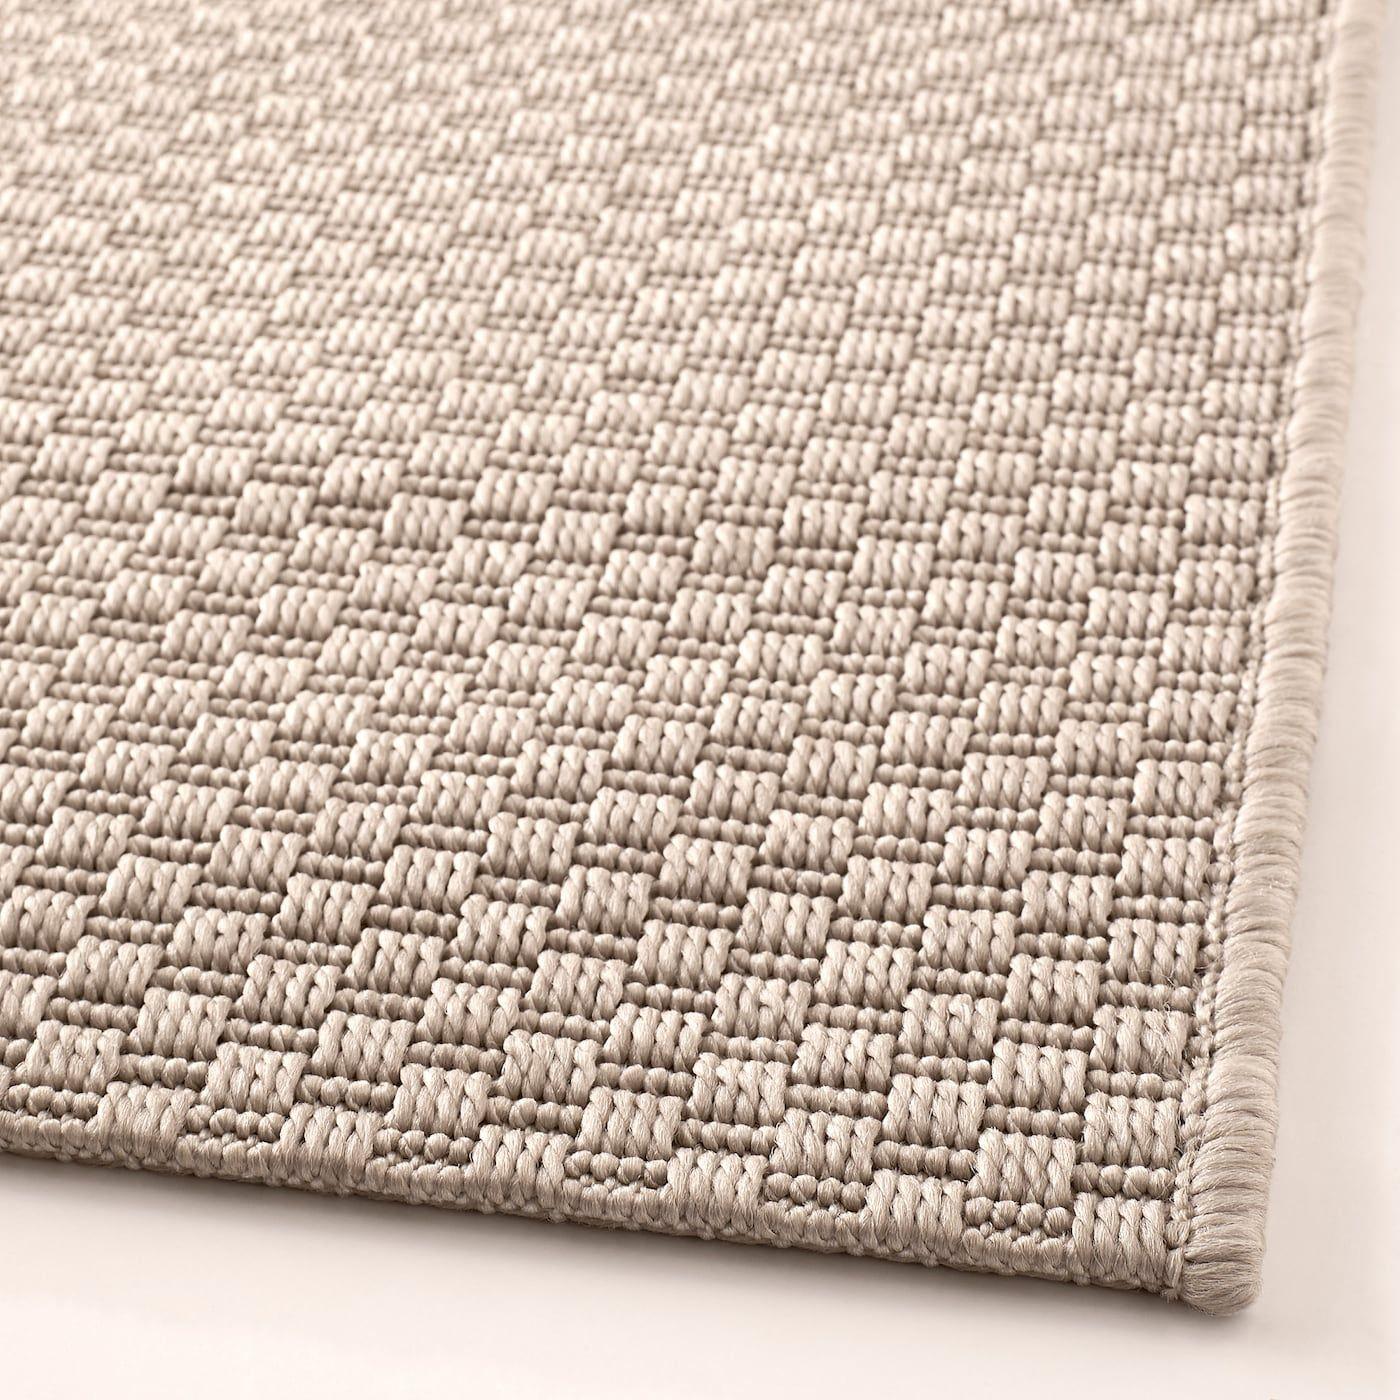 Morum Teppich Flach Gewebt Drinnen Drau Beige 160x230 Cm Ikea Österreich Teppich Flach Gewebt Teppich Ikea Teppich